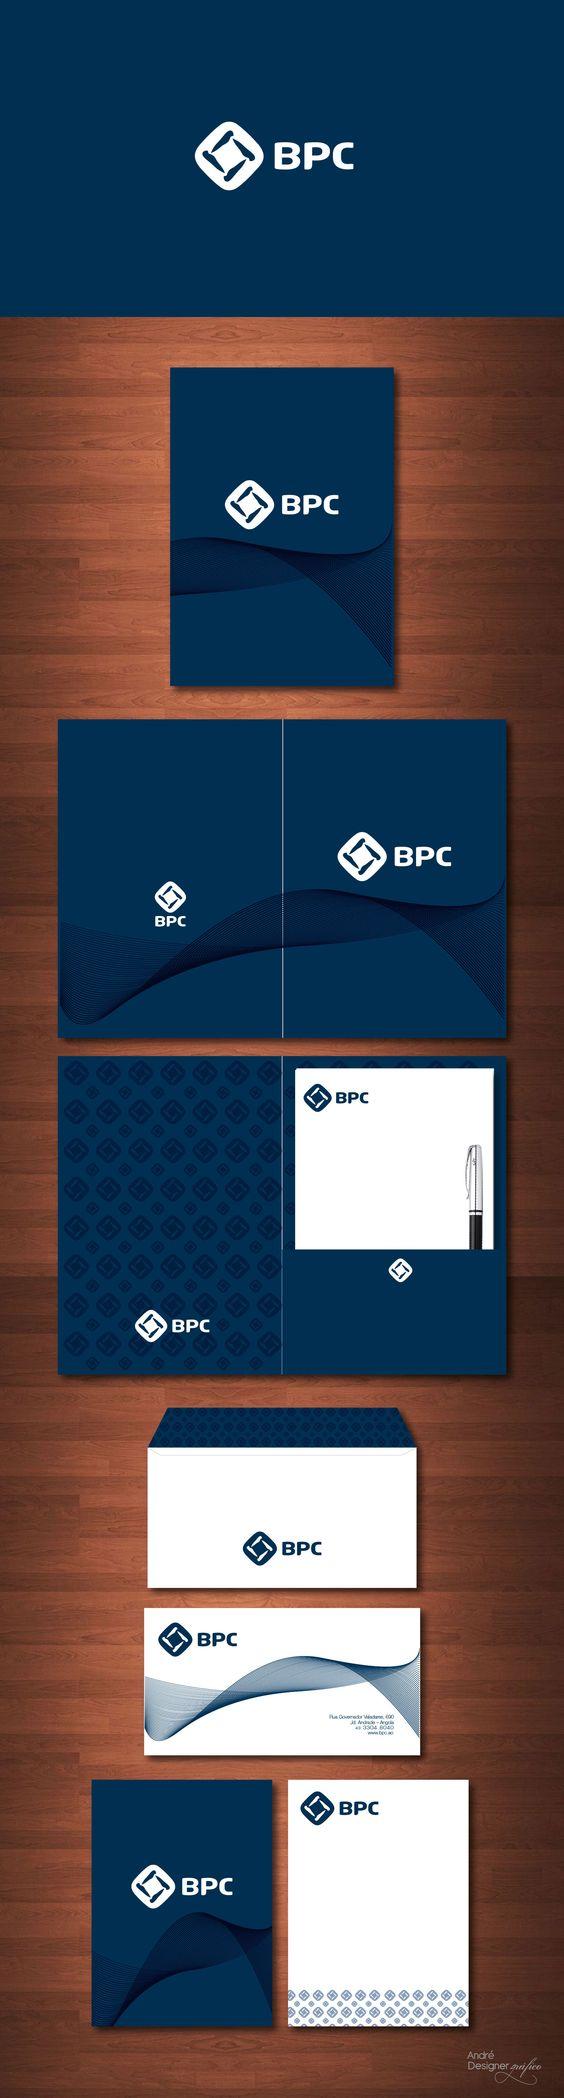 Papelaria Banco BPC - Luanda - Angola